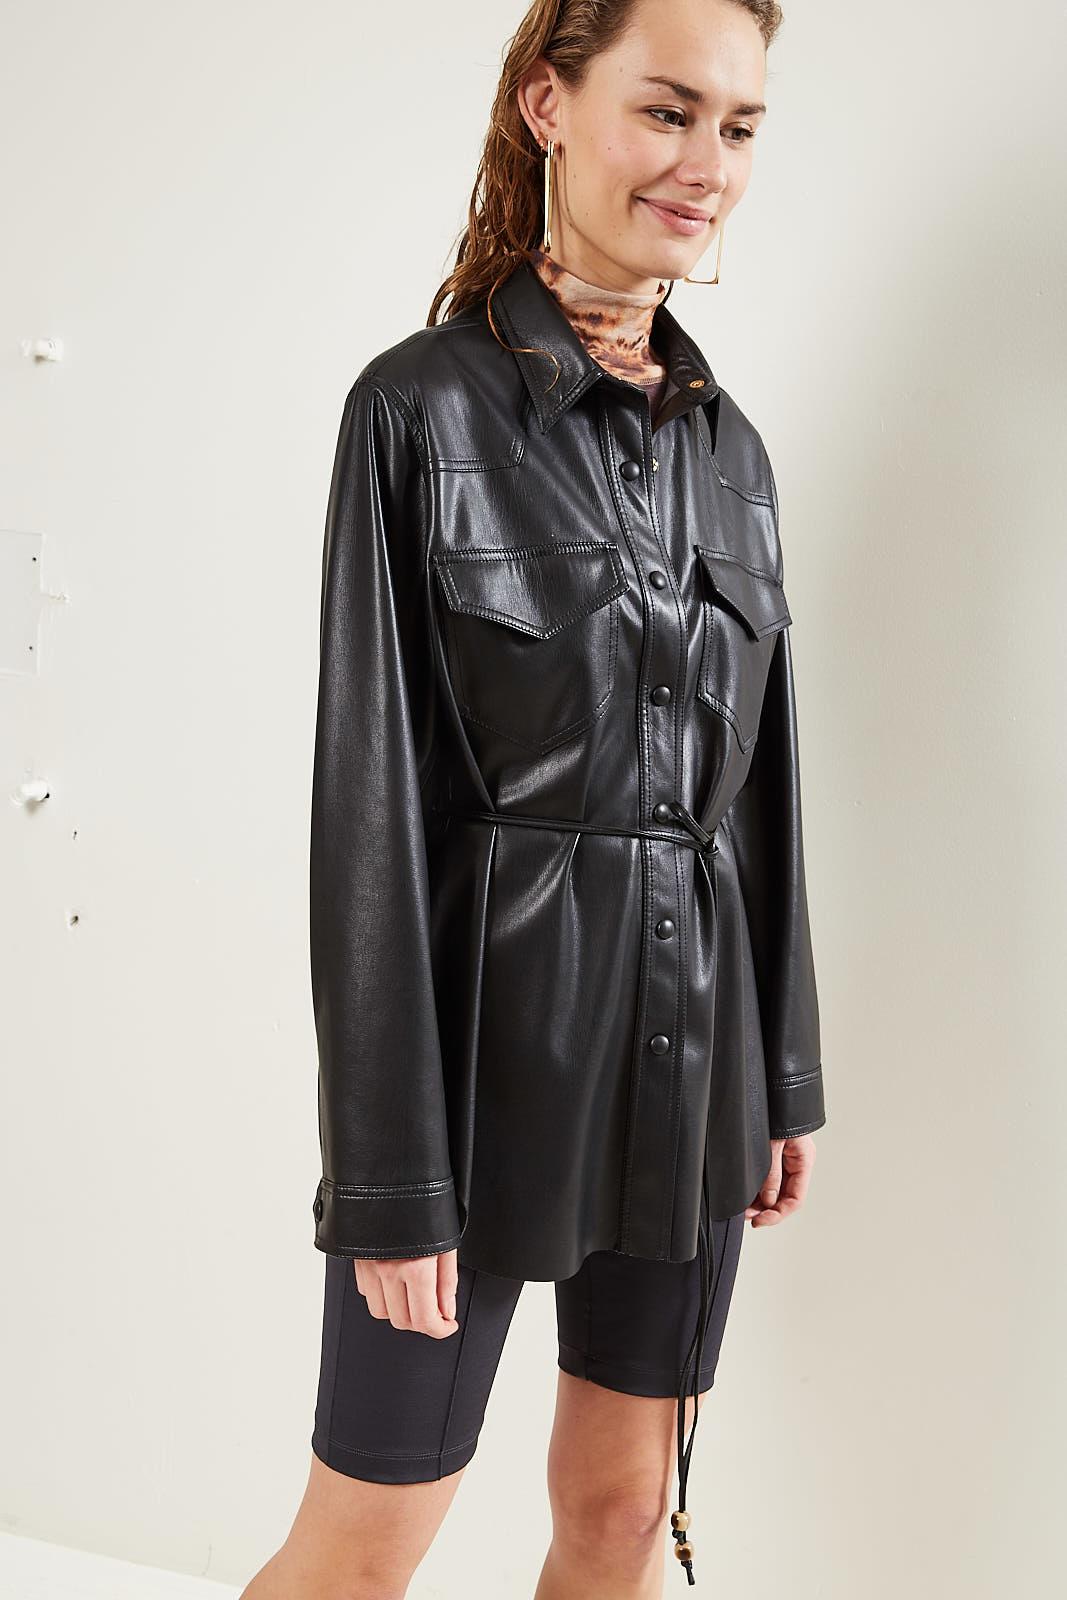 Nanushka Eddy Vegan Leather shirt black